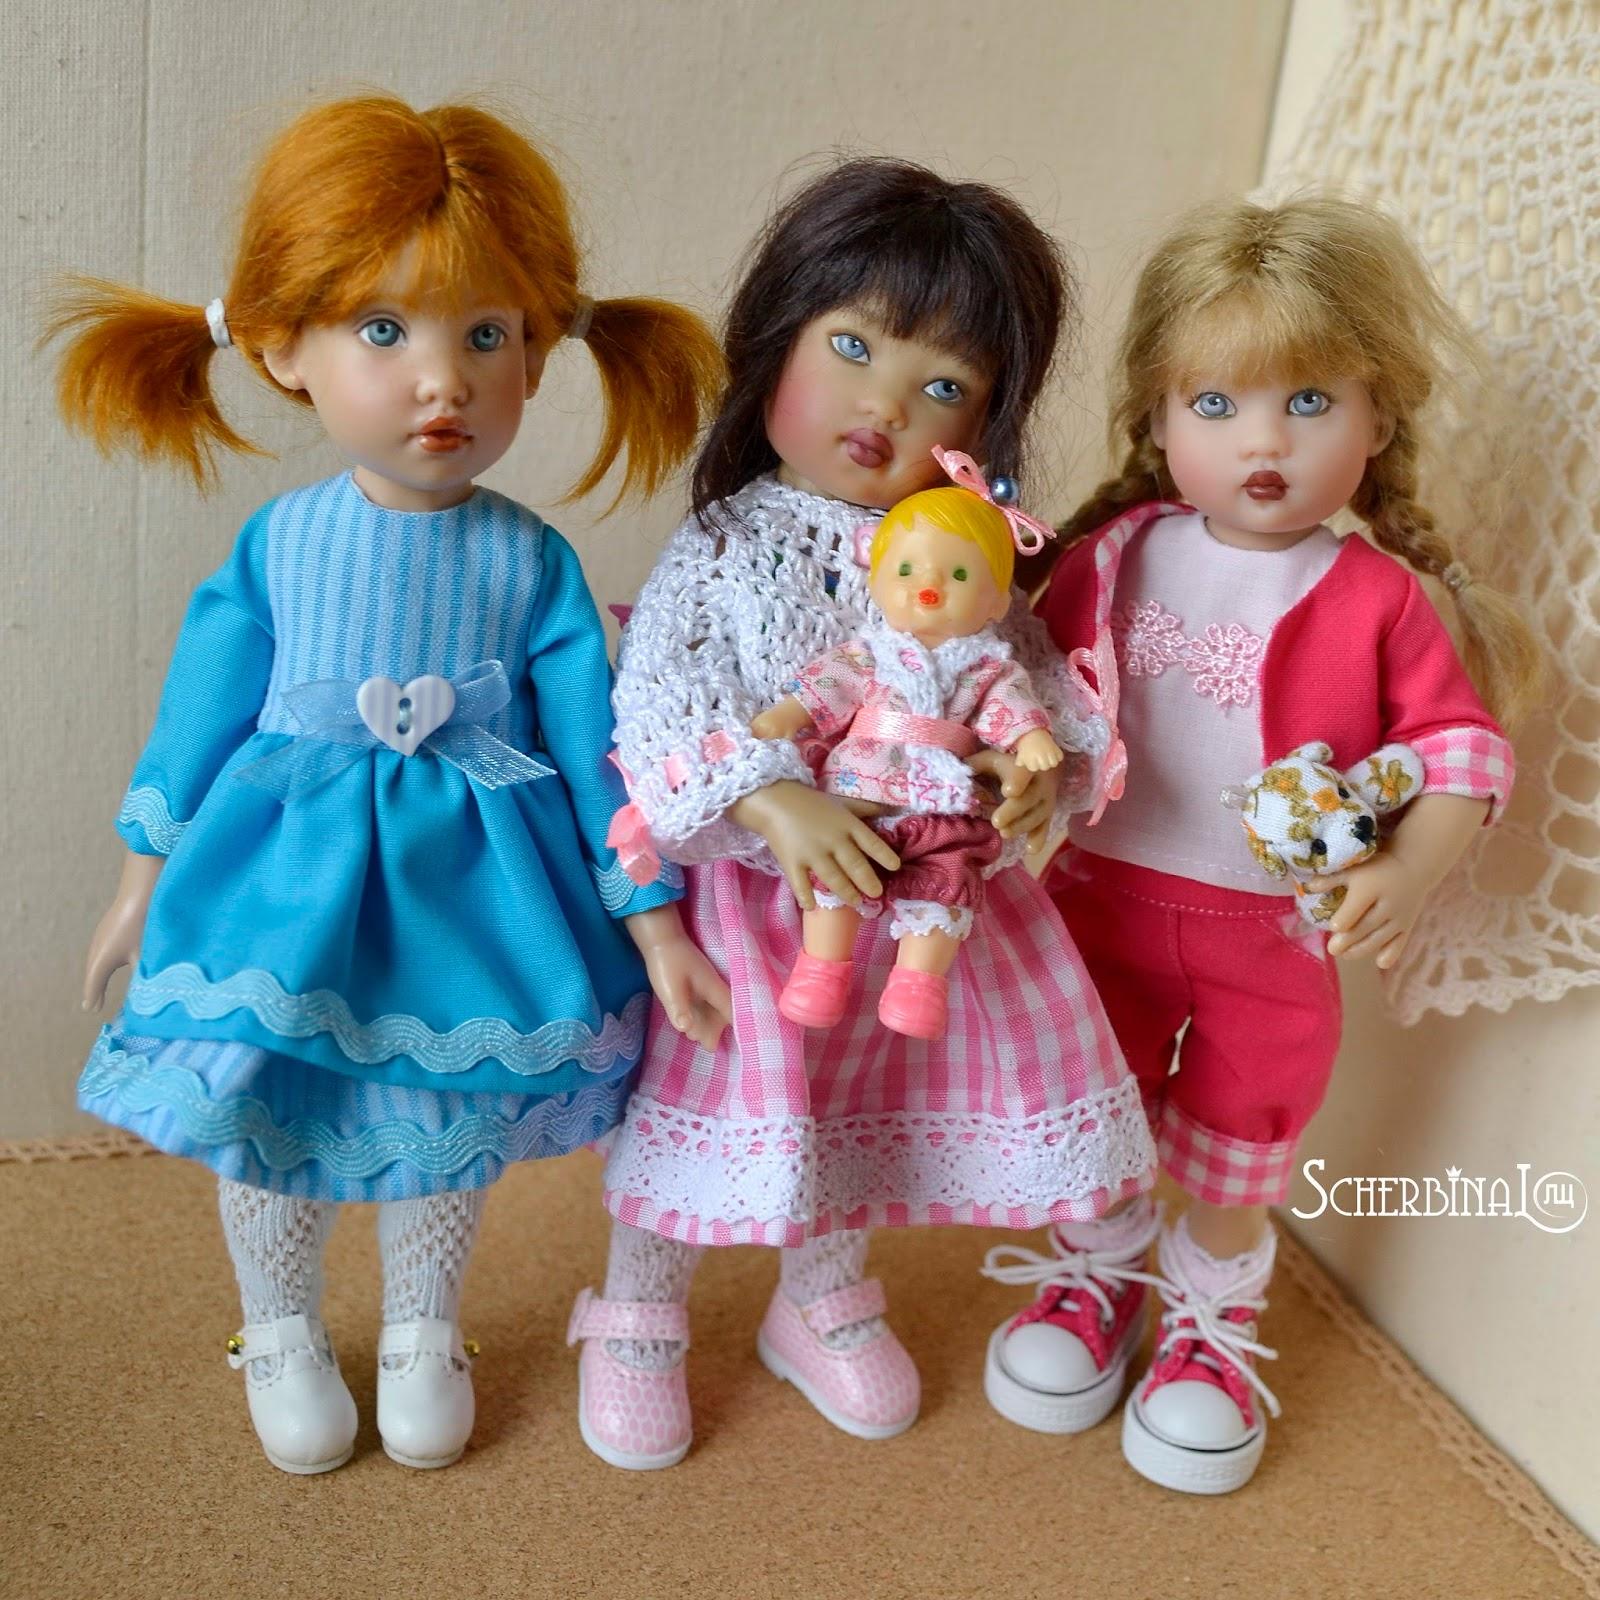 Коллекционные куклы Helen Kish: Tulah, Riley, Zsu Zse